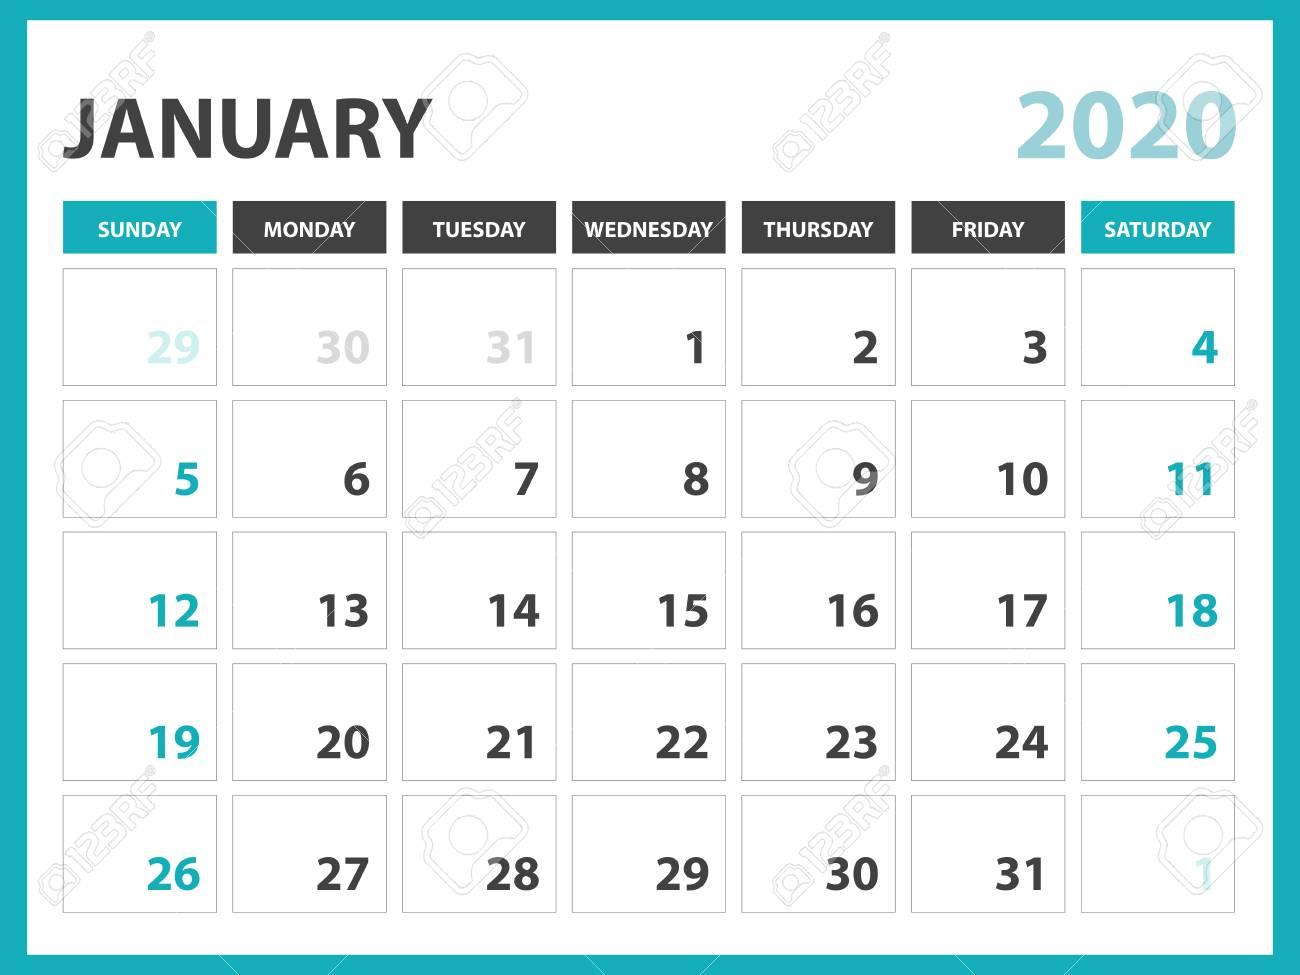 January 2020 Calendar Design Desk Calendar Layout Size 8 X 6 Inch, January 2020 Calendar